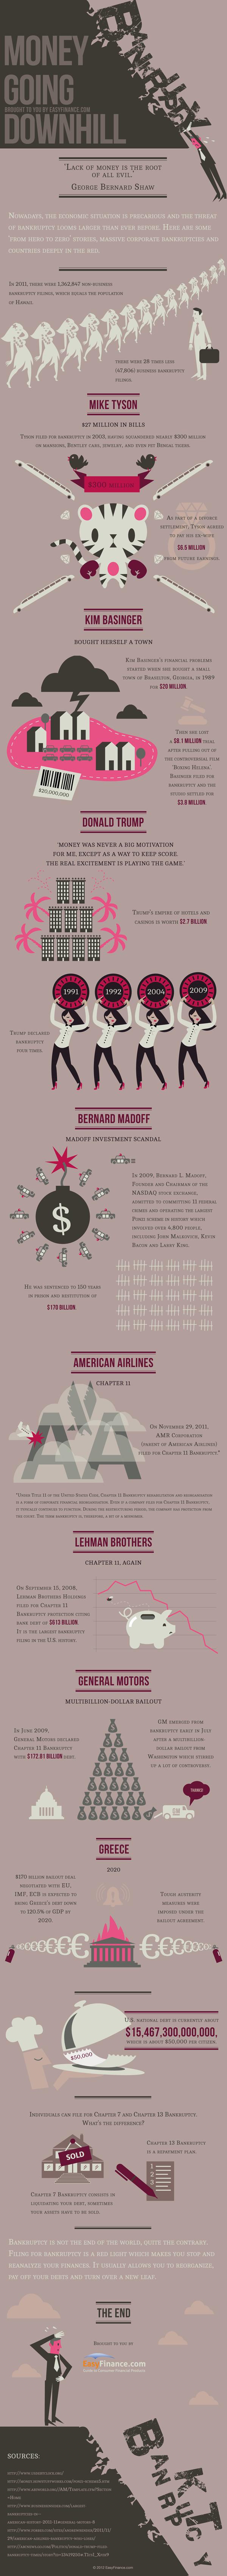 Money Going Downhill (Infographic)